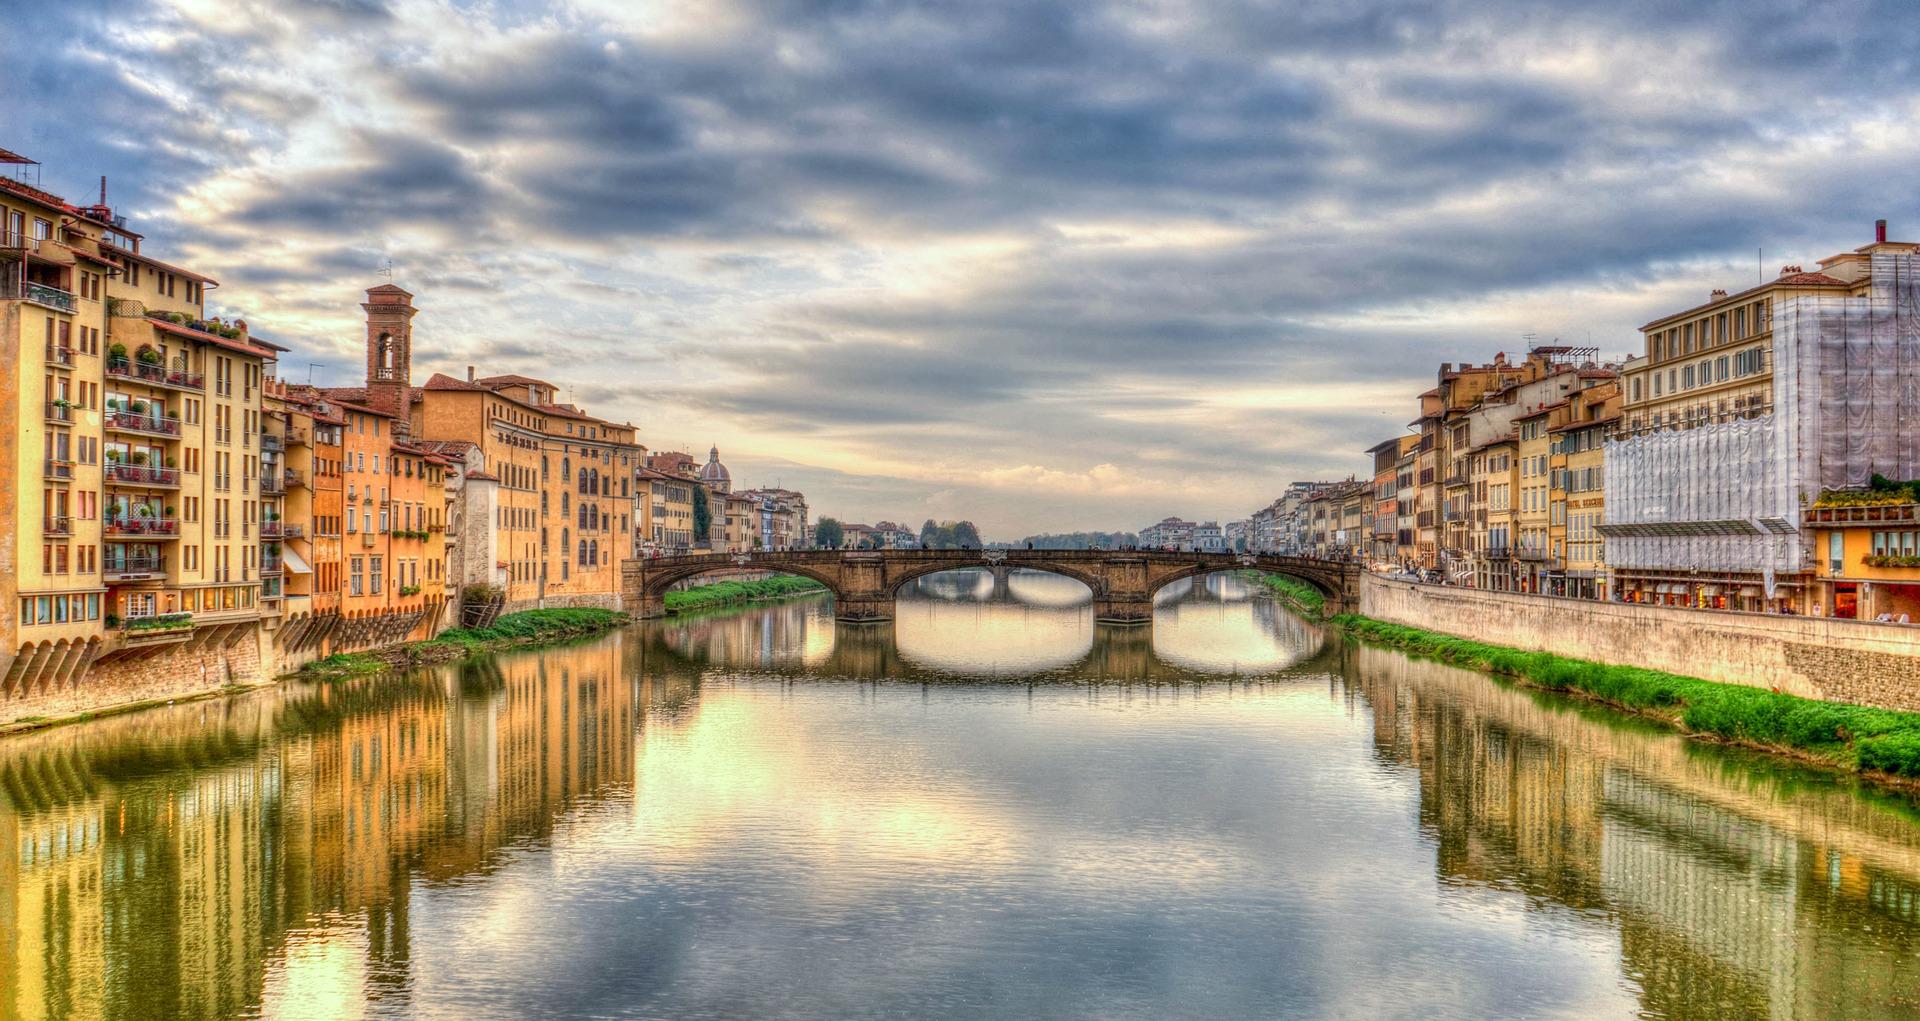 Emerald-Waterways-Arno-River | AardvarkCompare.com